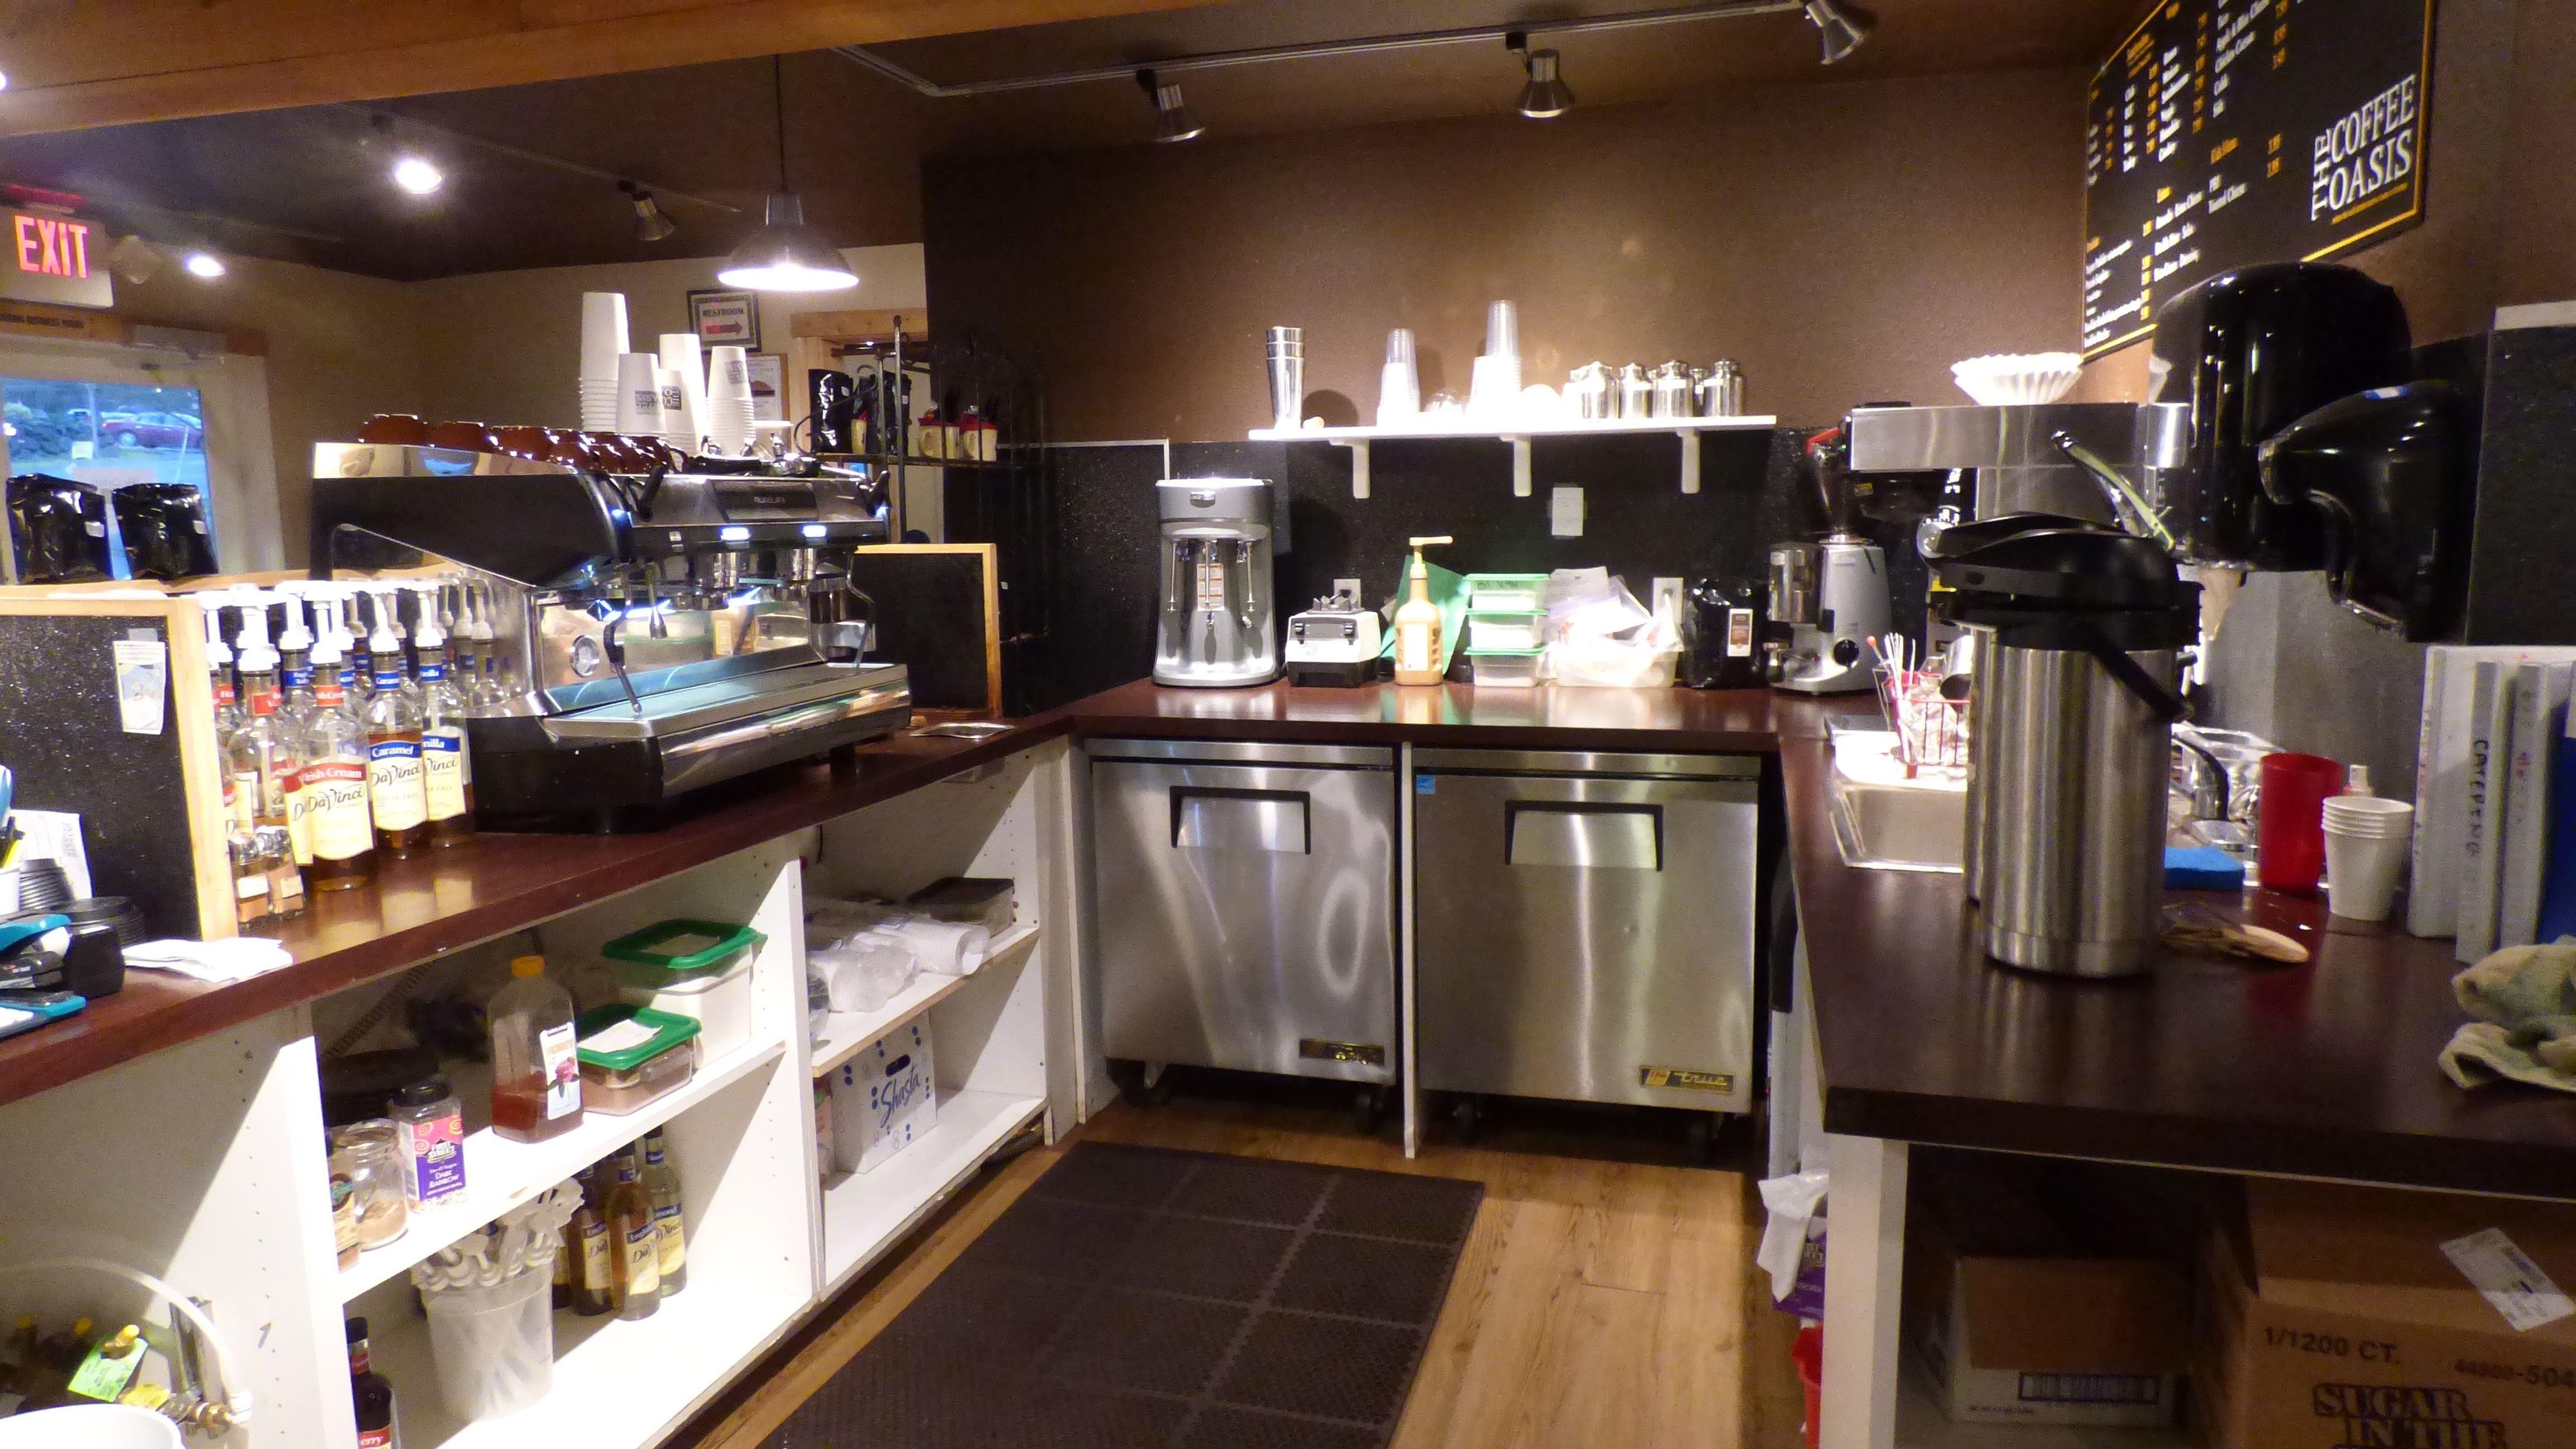 The Coffee Oasis Poulsbo Galley Kitsap Charity Kitsapcares Bremerton Poulsbo Port Orchard Photo Ken Rury Sponsored By Poulsbo Coffee Shop Business Hotel